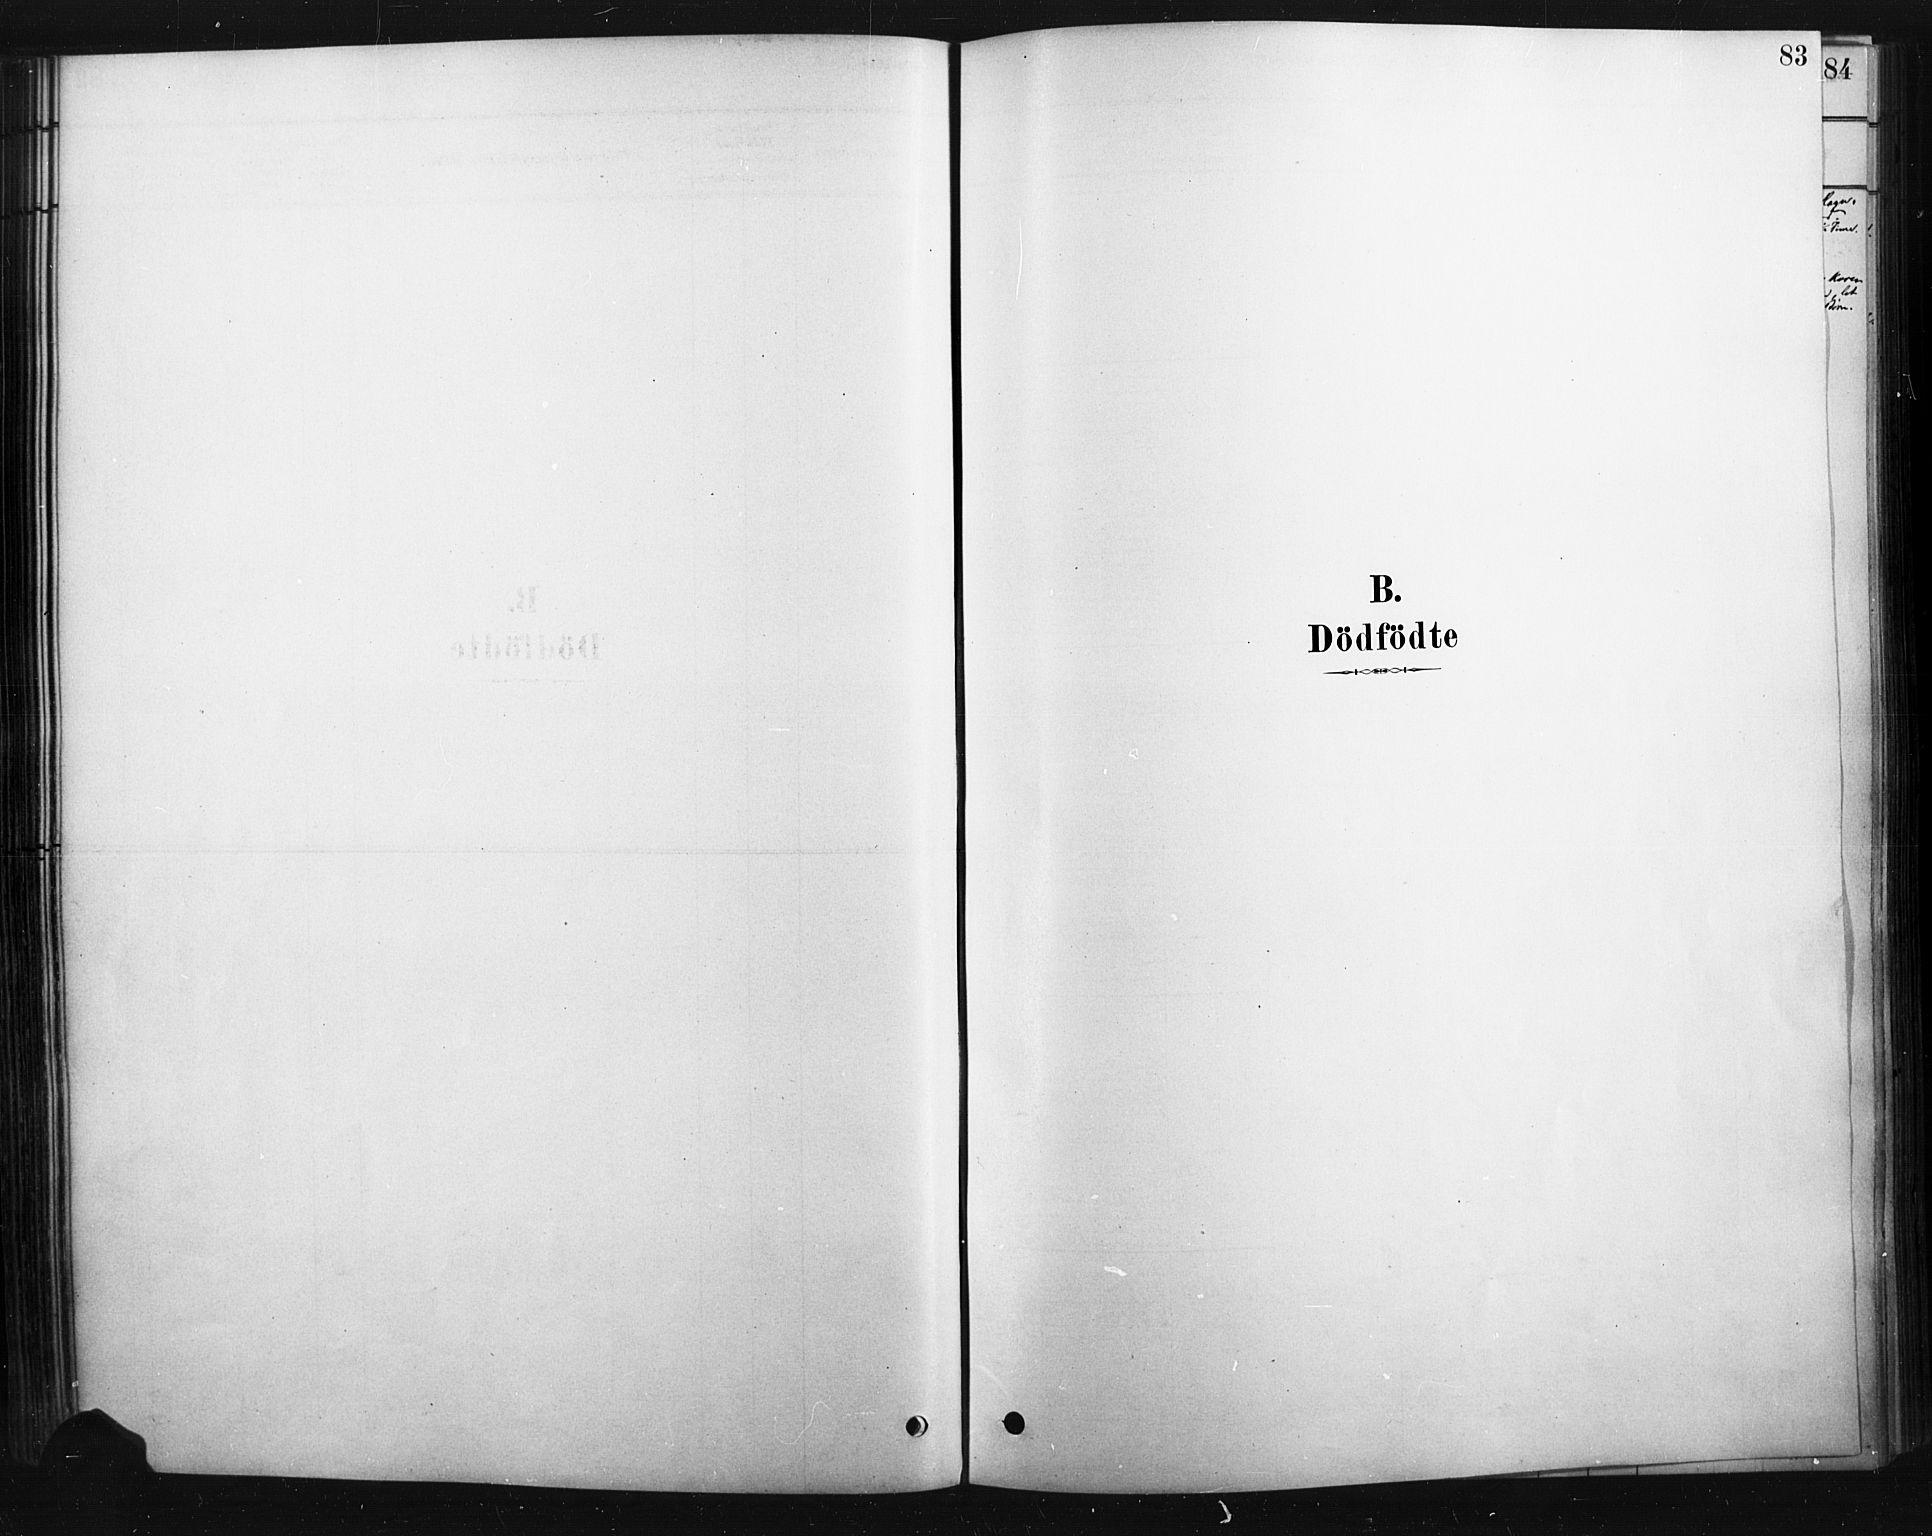 SAH, Rendalen prestekontor, H/Ha/Haa/L0010: Ministerialbok nr. 10, 1878-1901, s. 83